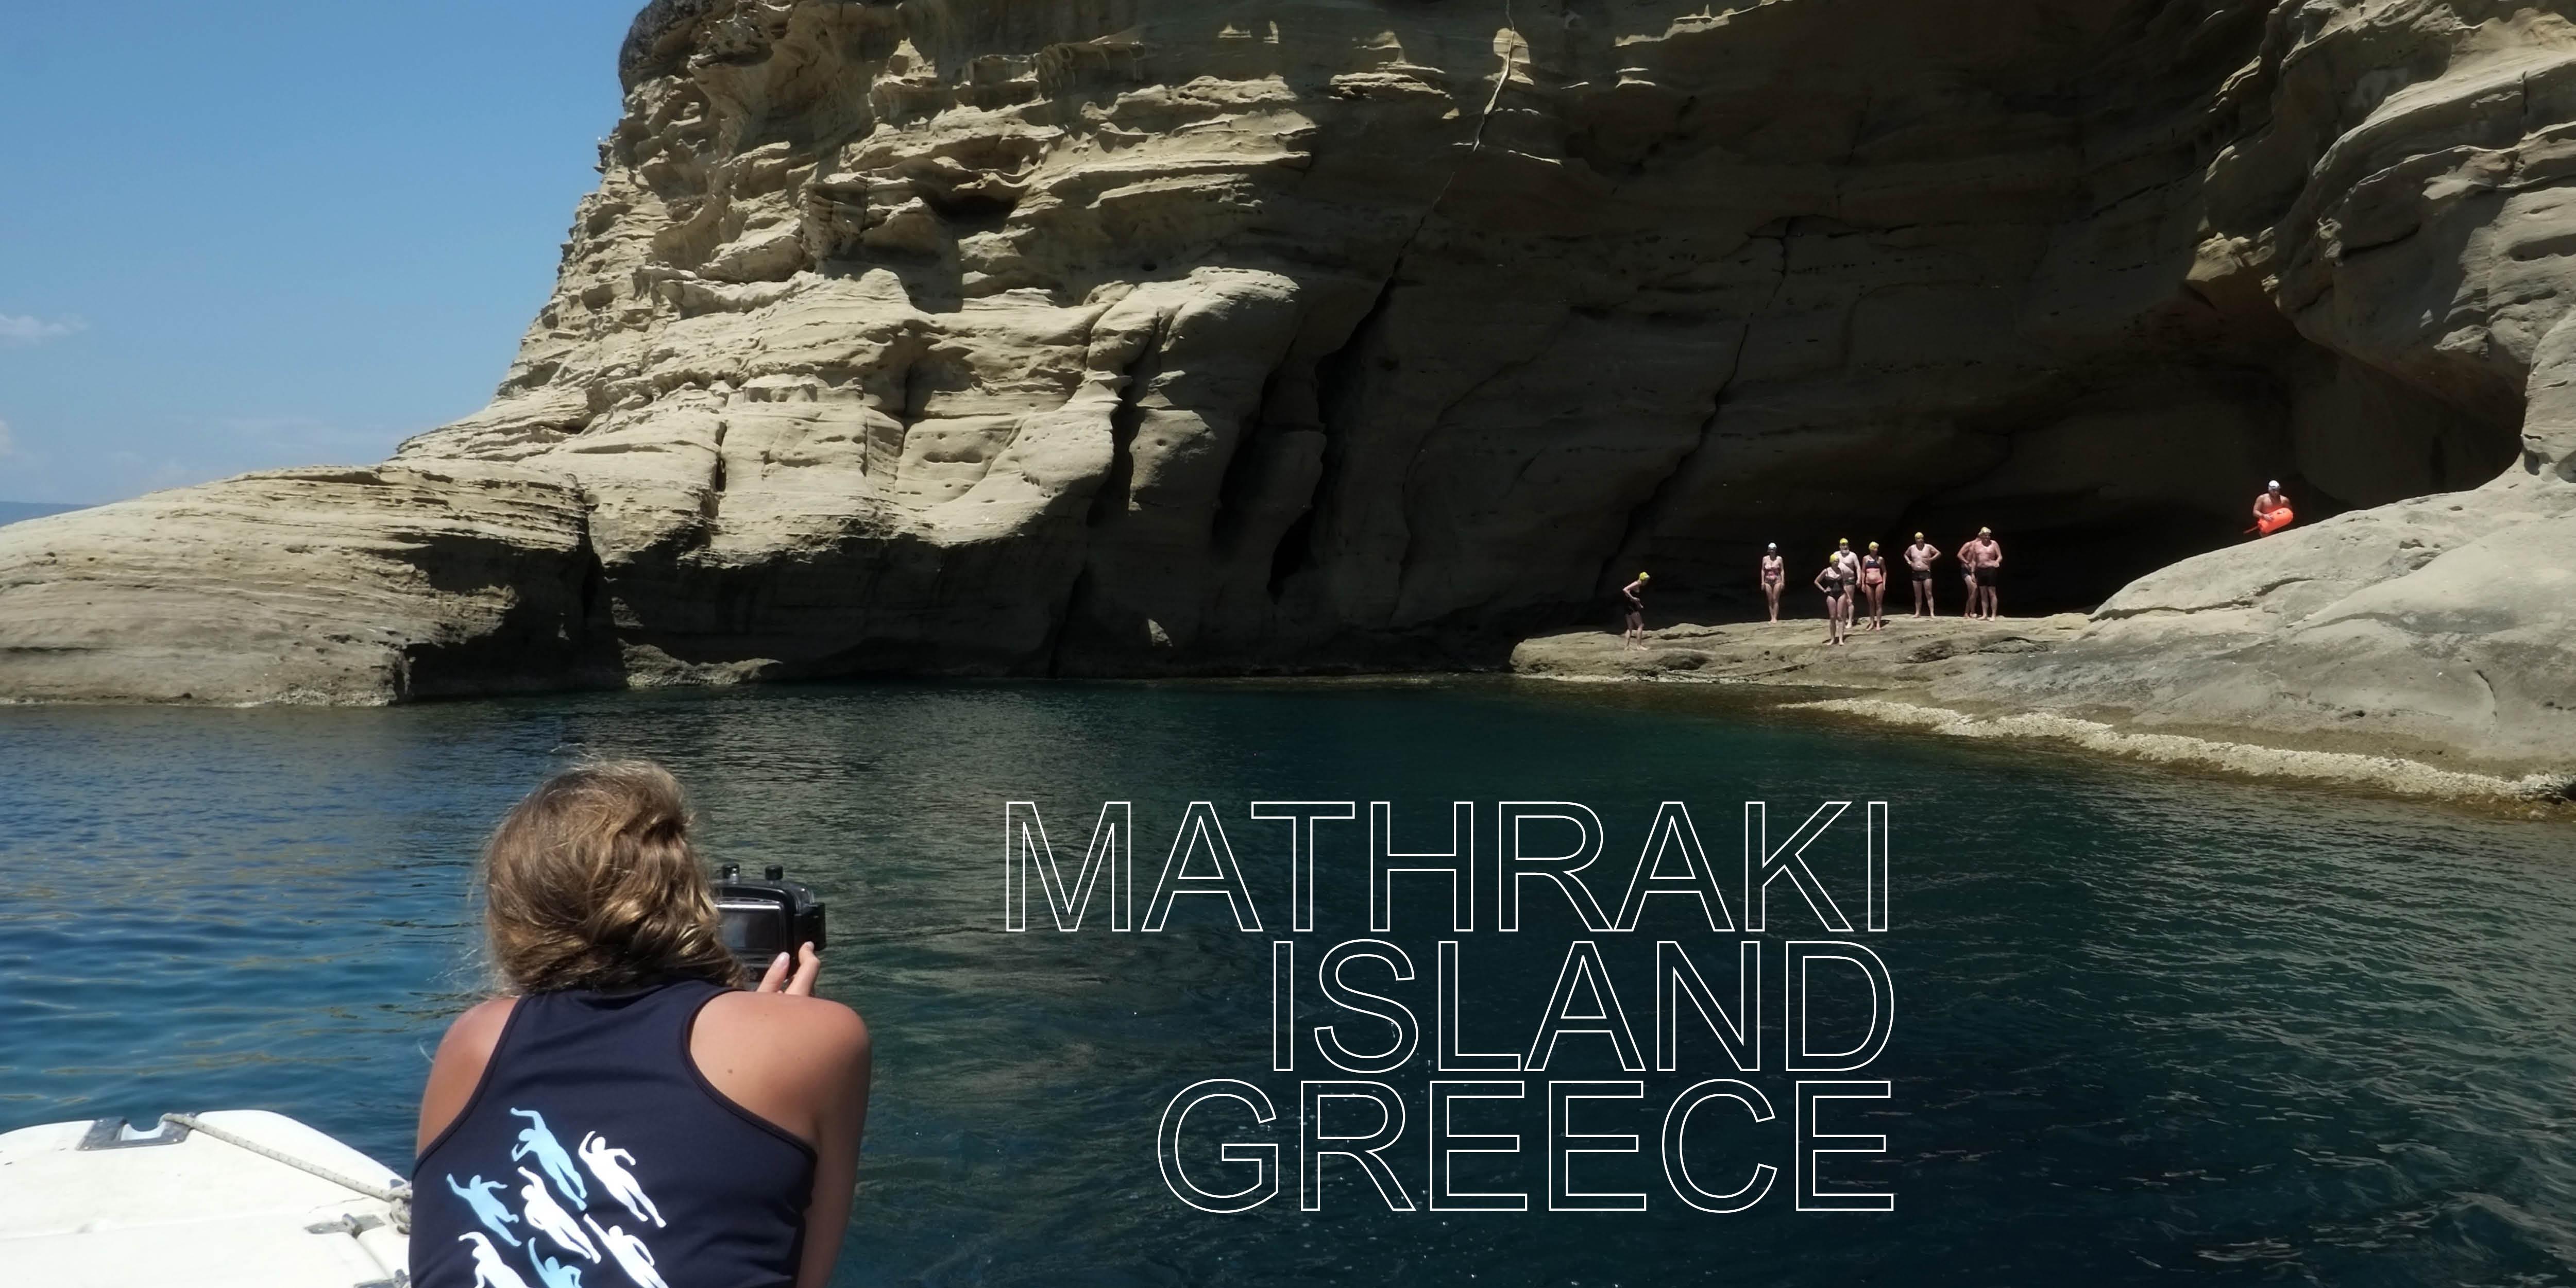 Mathraki Island Greece